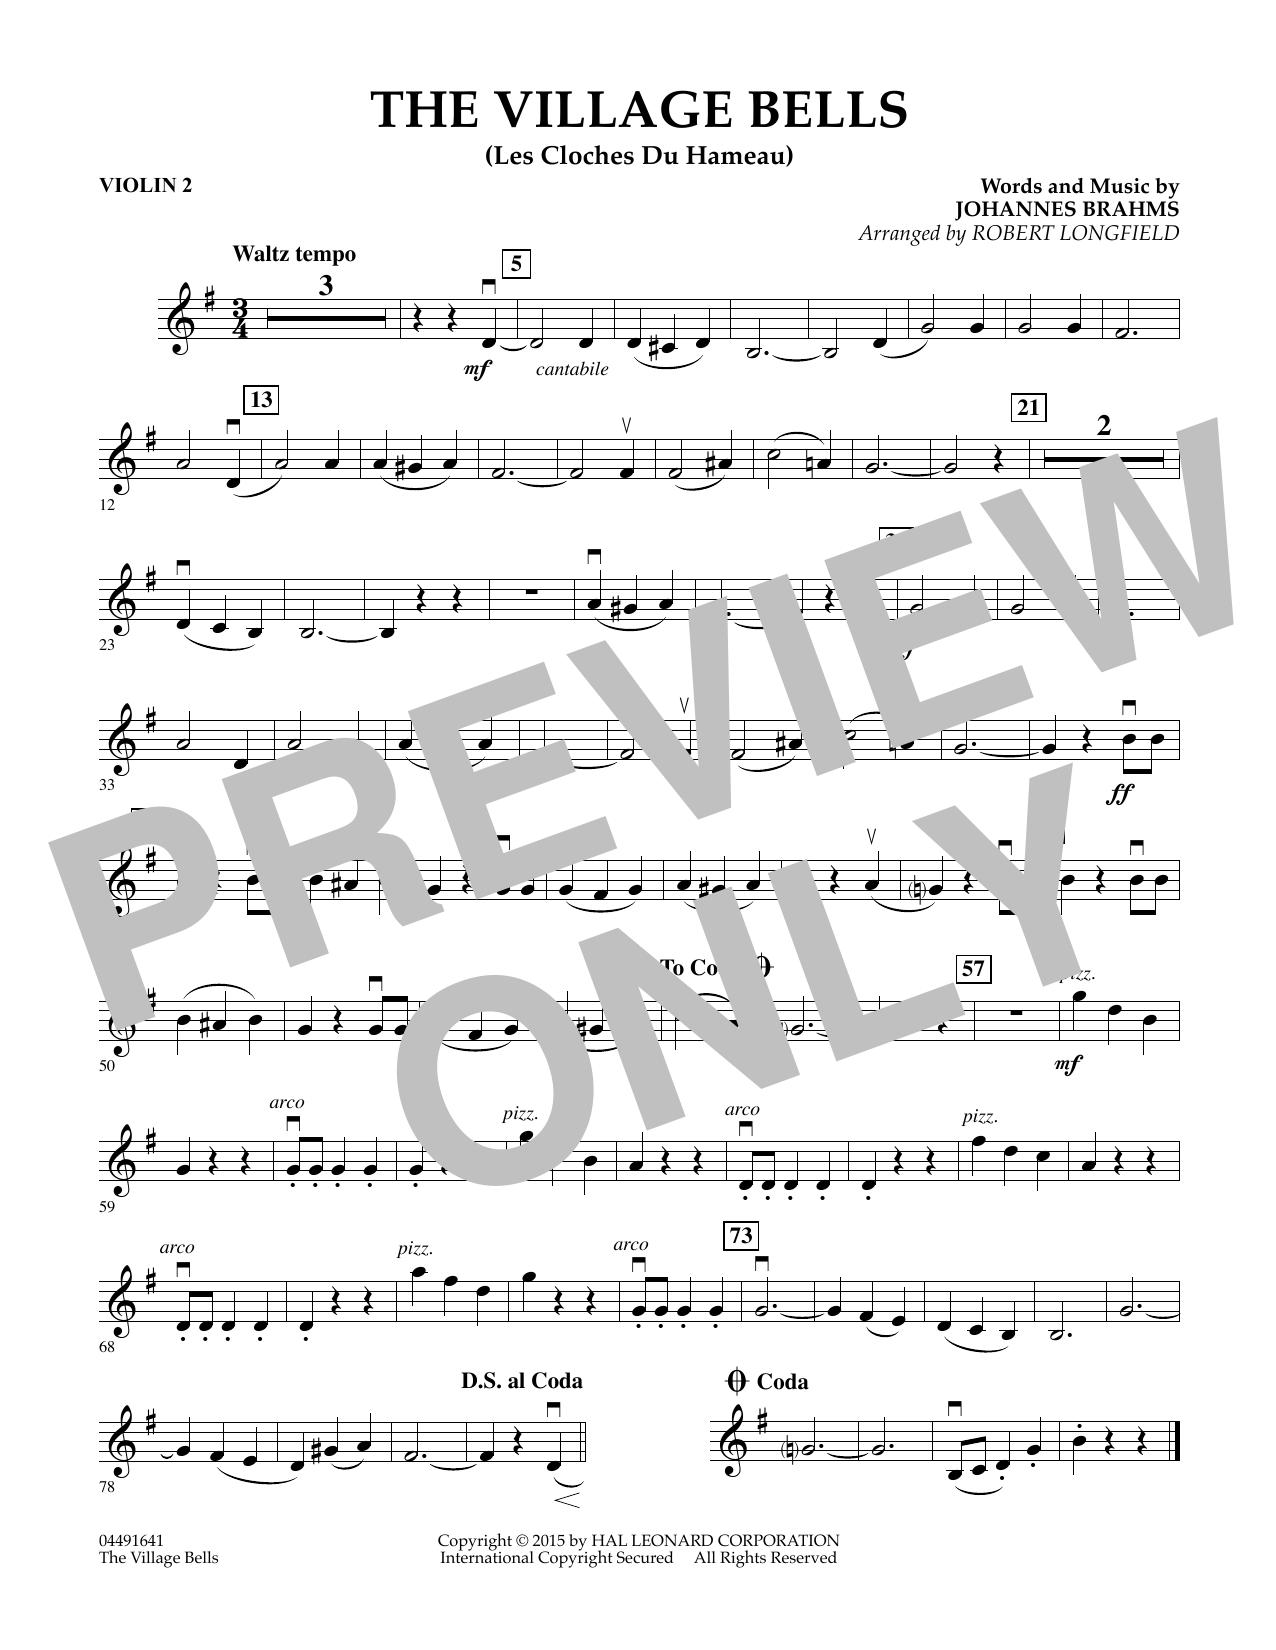 The Village Bells (Les Cloche du Hameau) - Violin 2 (Orchestra)